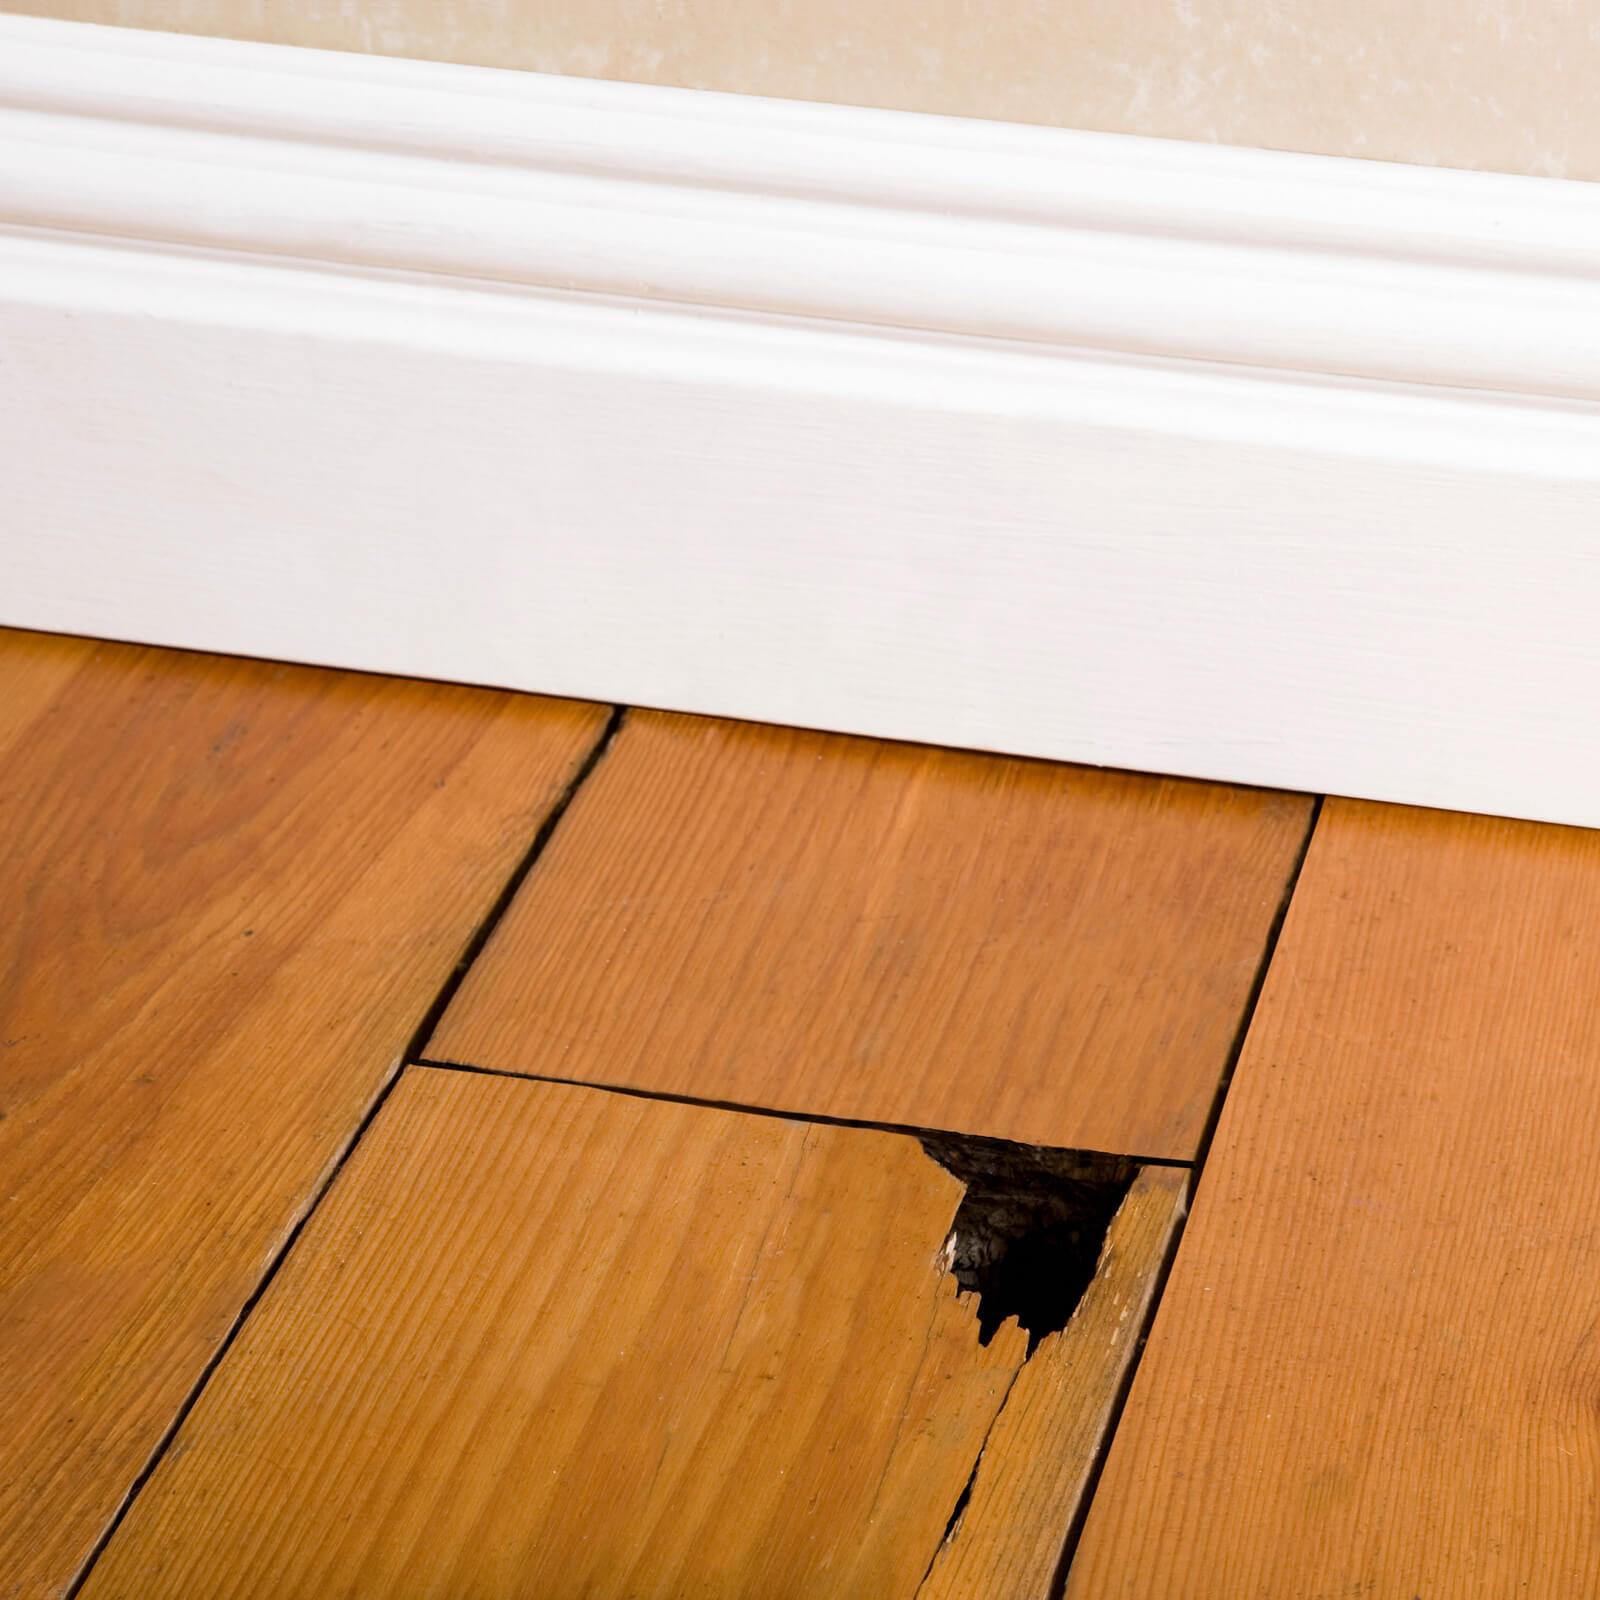 Hardwood Restoration Durham, NC | Flooring By Design